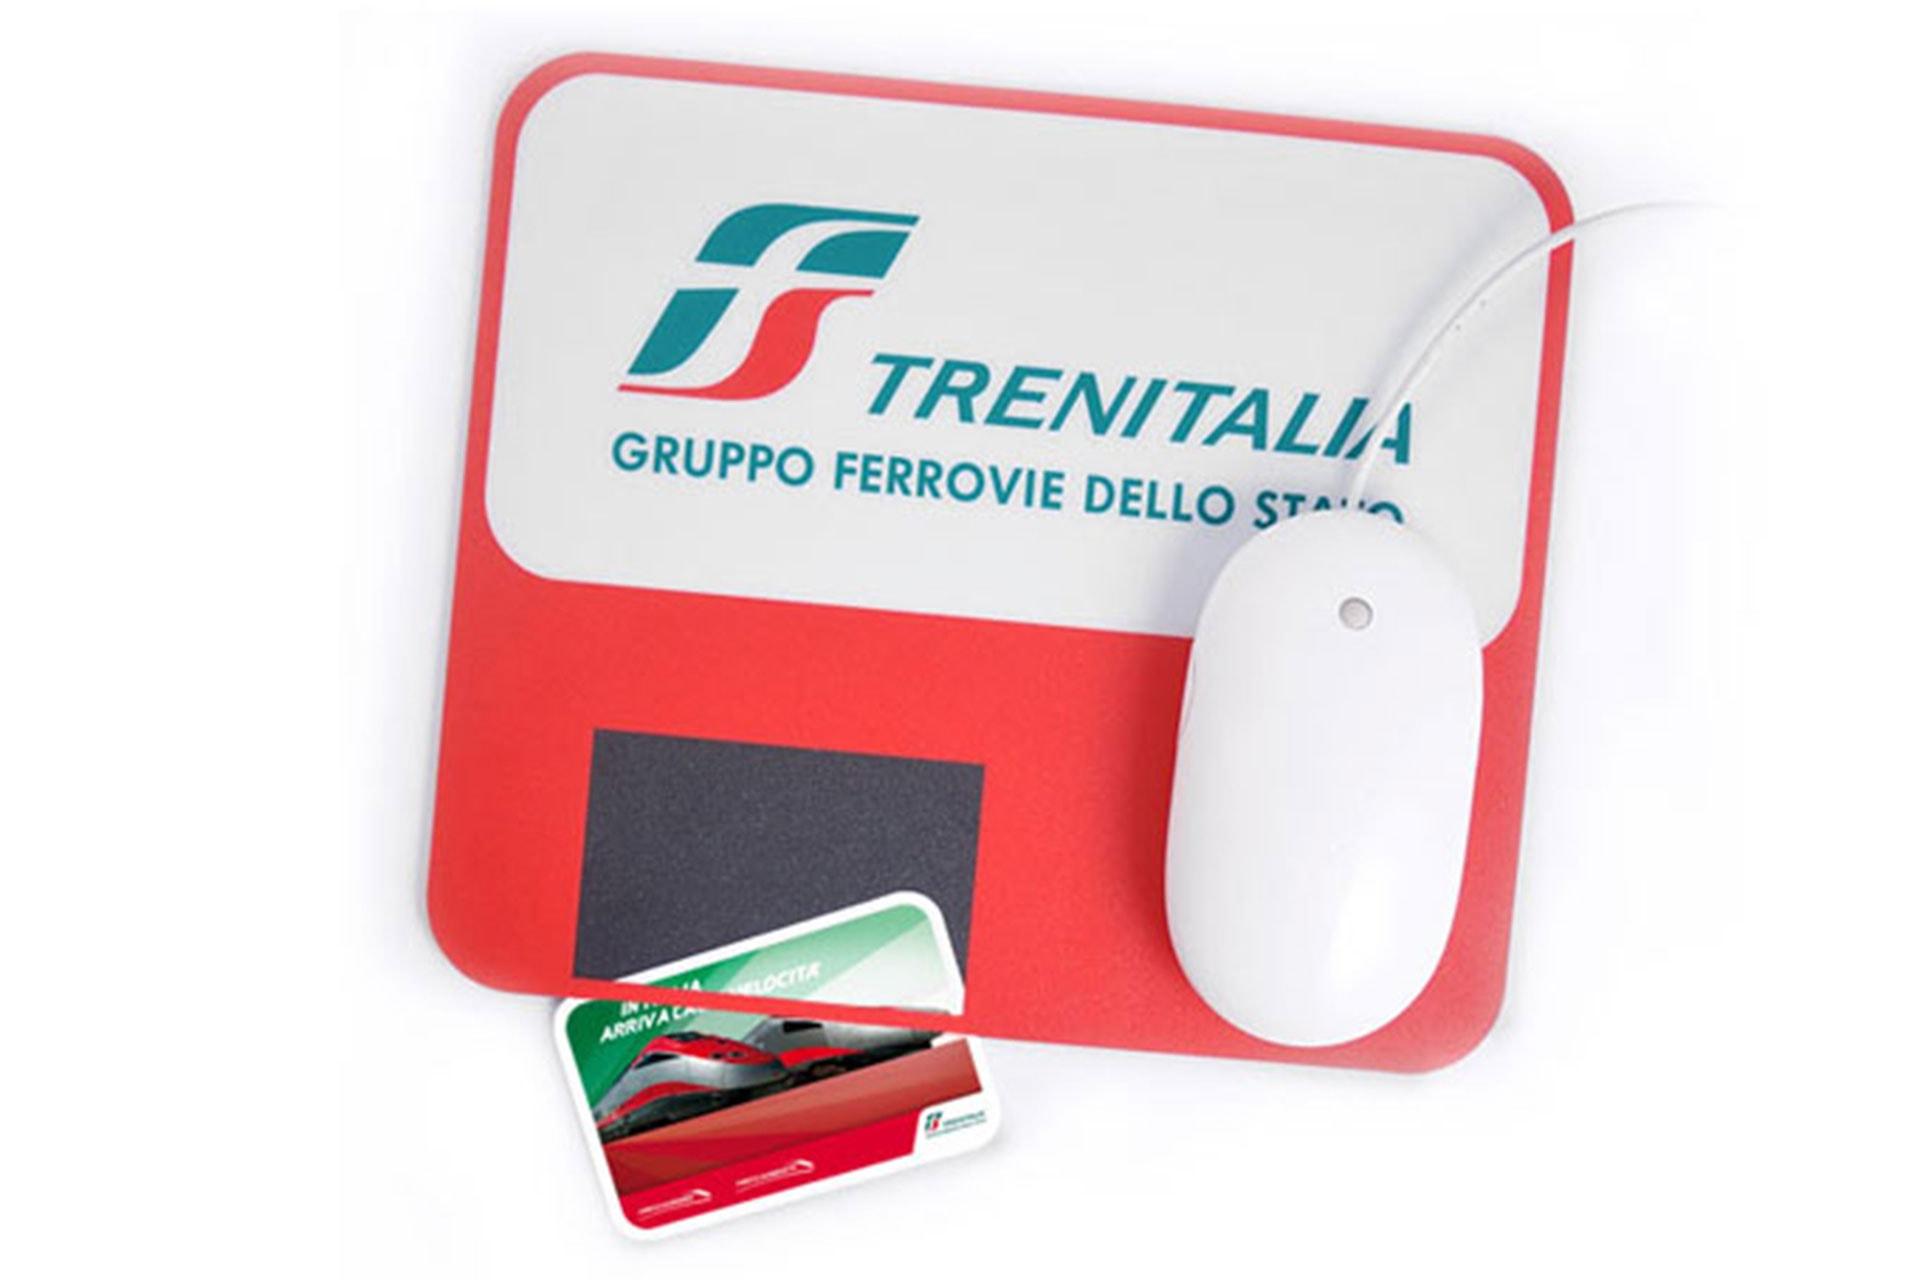 Tappetino mouse con tasca porta card